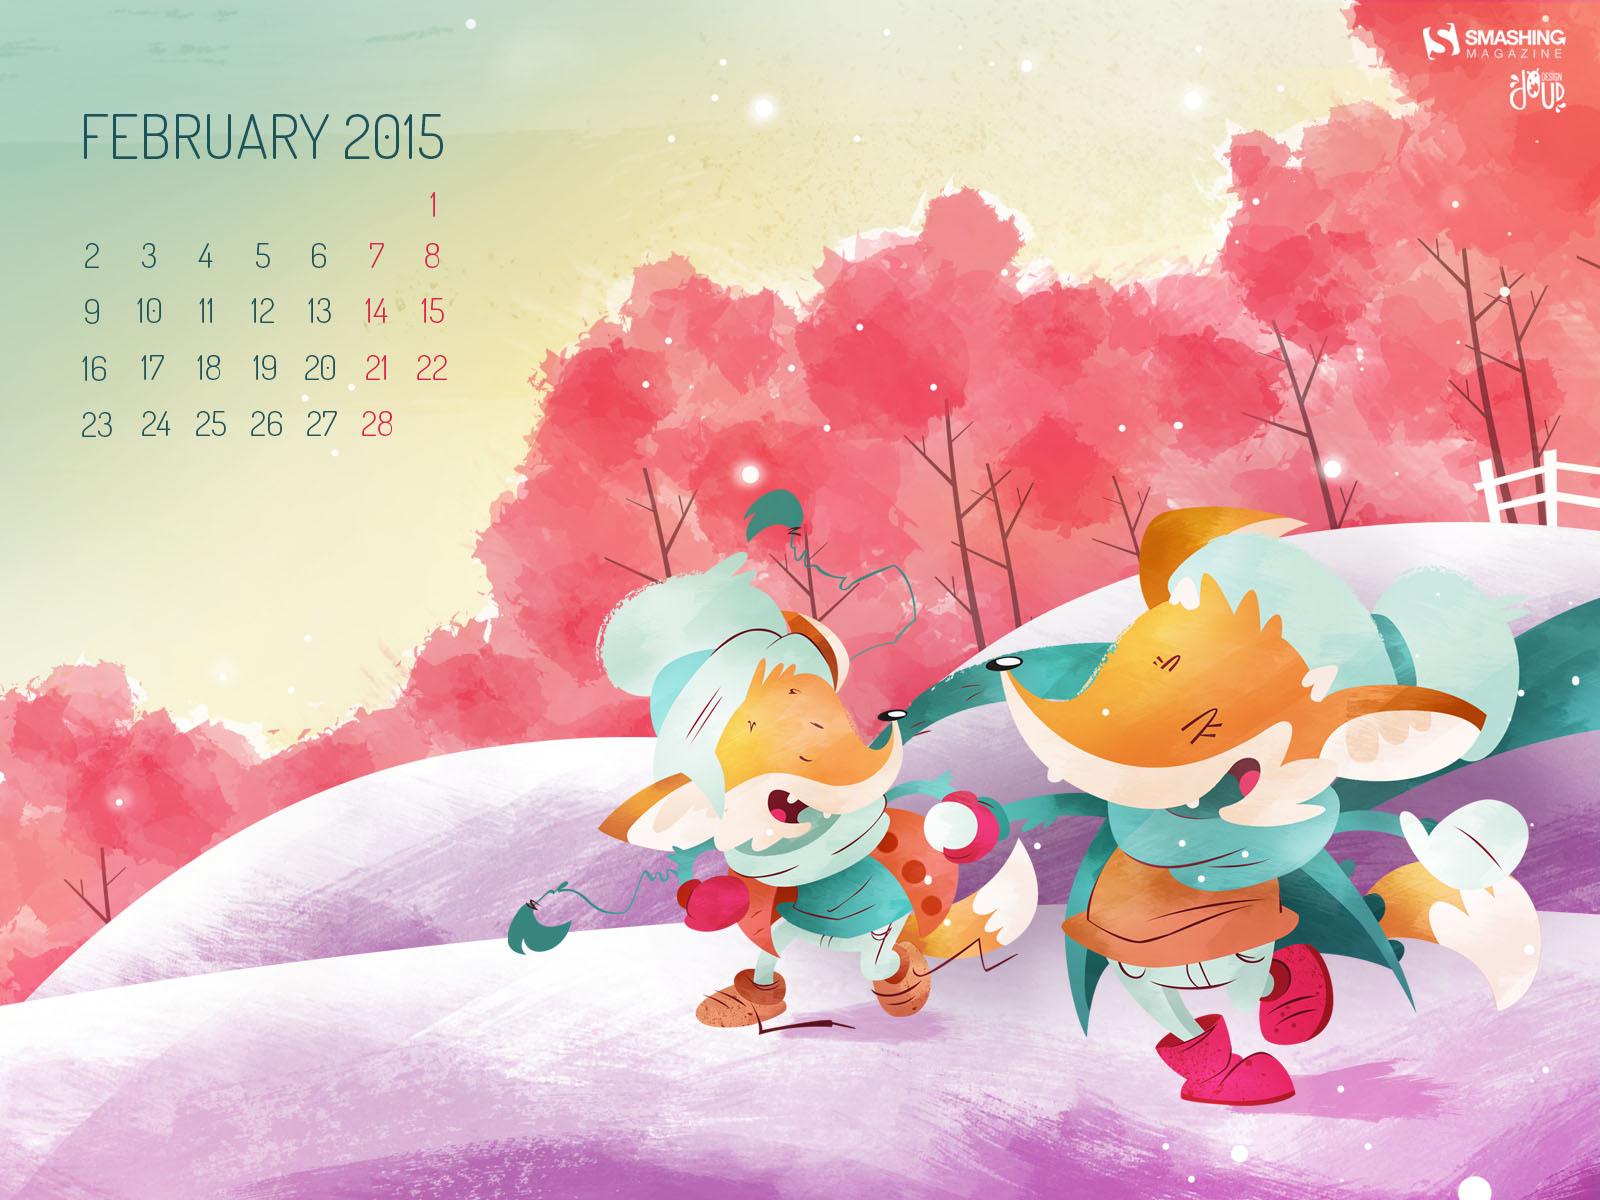 Desktop Wallpaper Calendars February 2015 Smashing Magazine 1600x1200